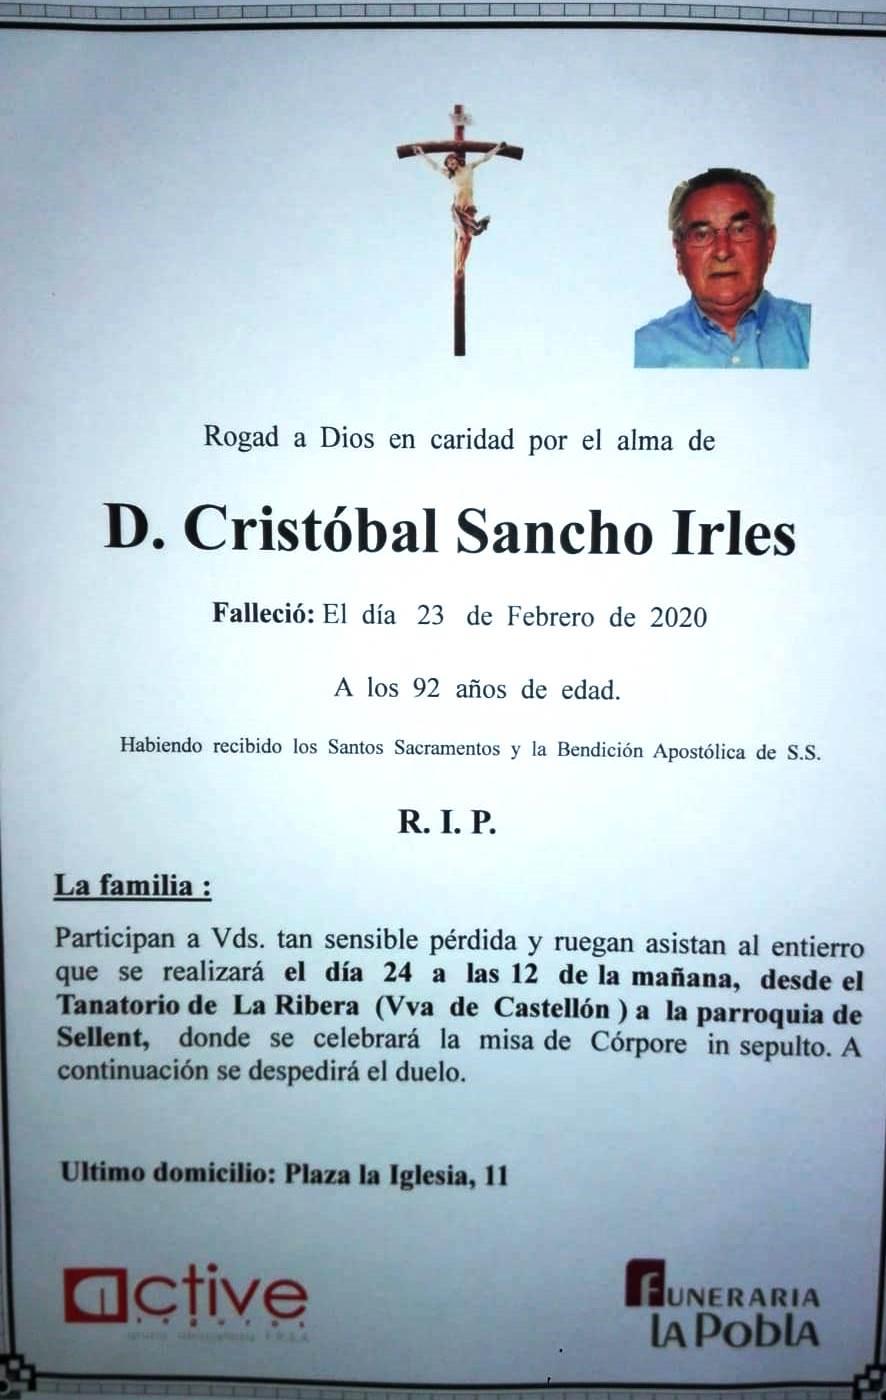 CRISTÓBAL SANCHO IRLES